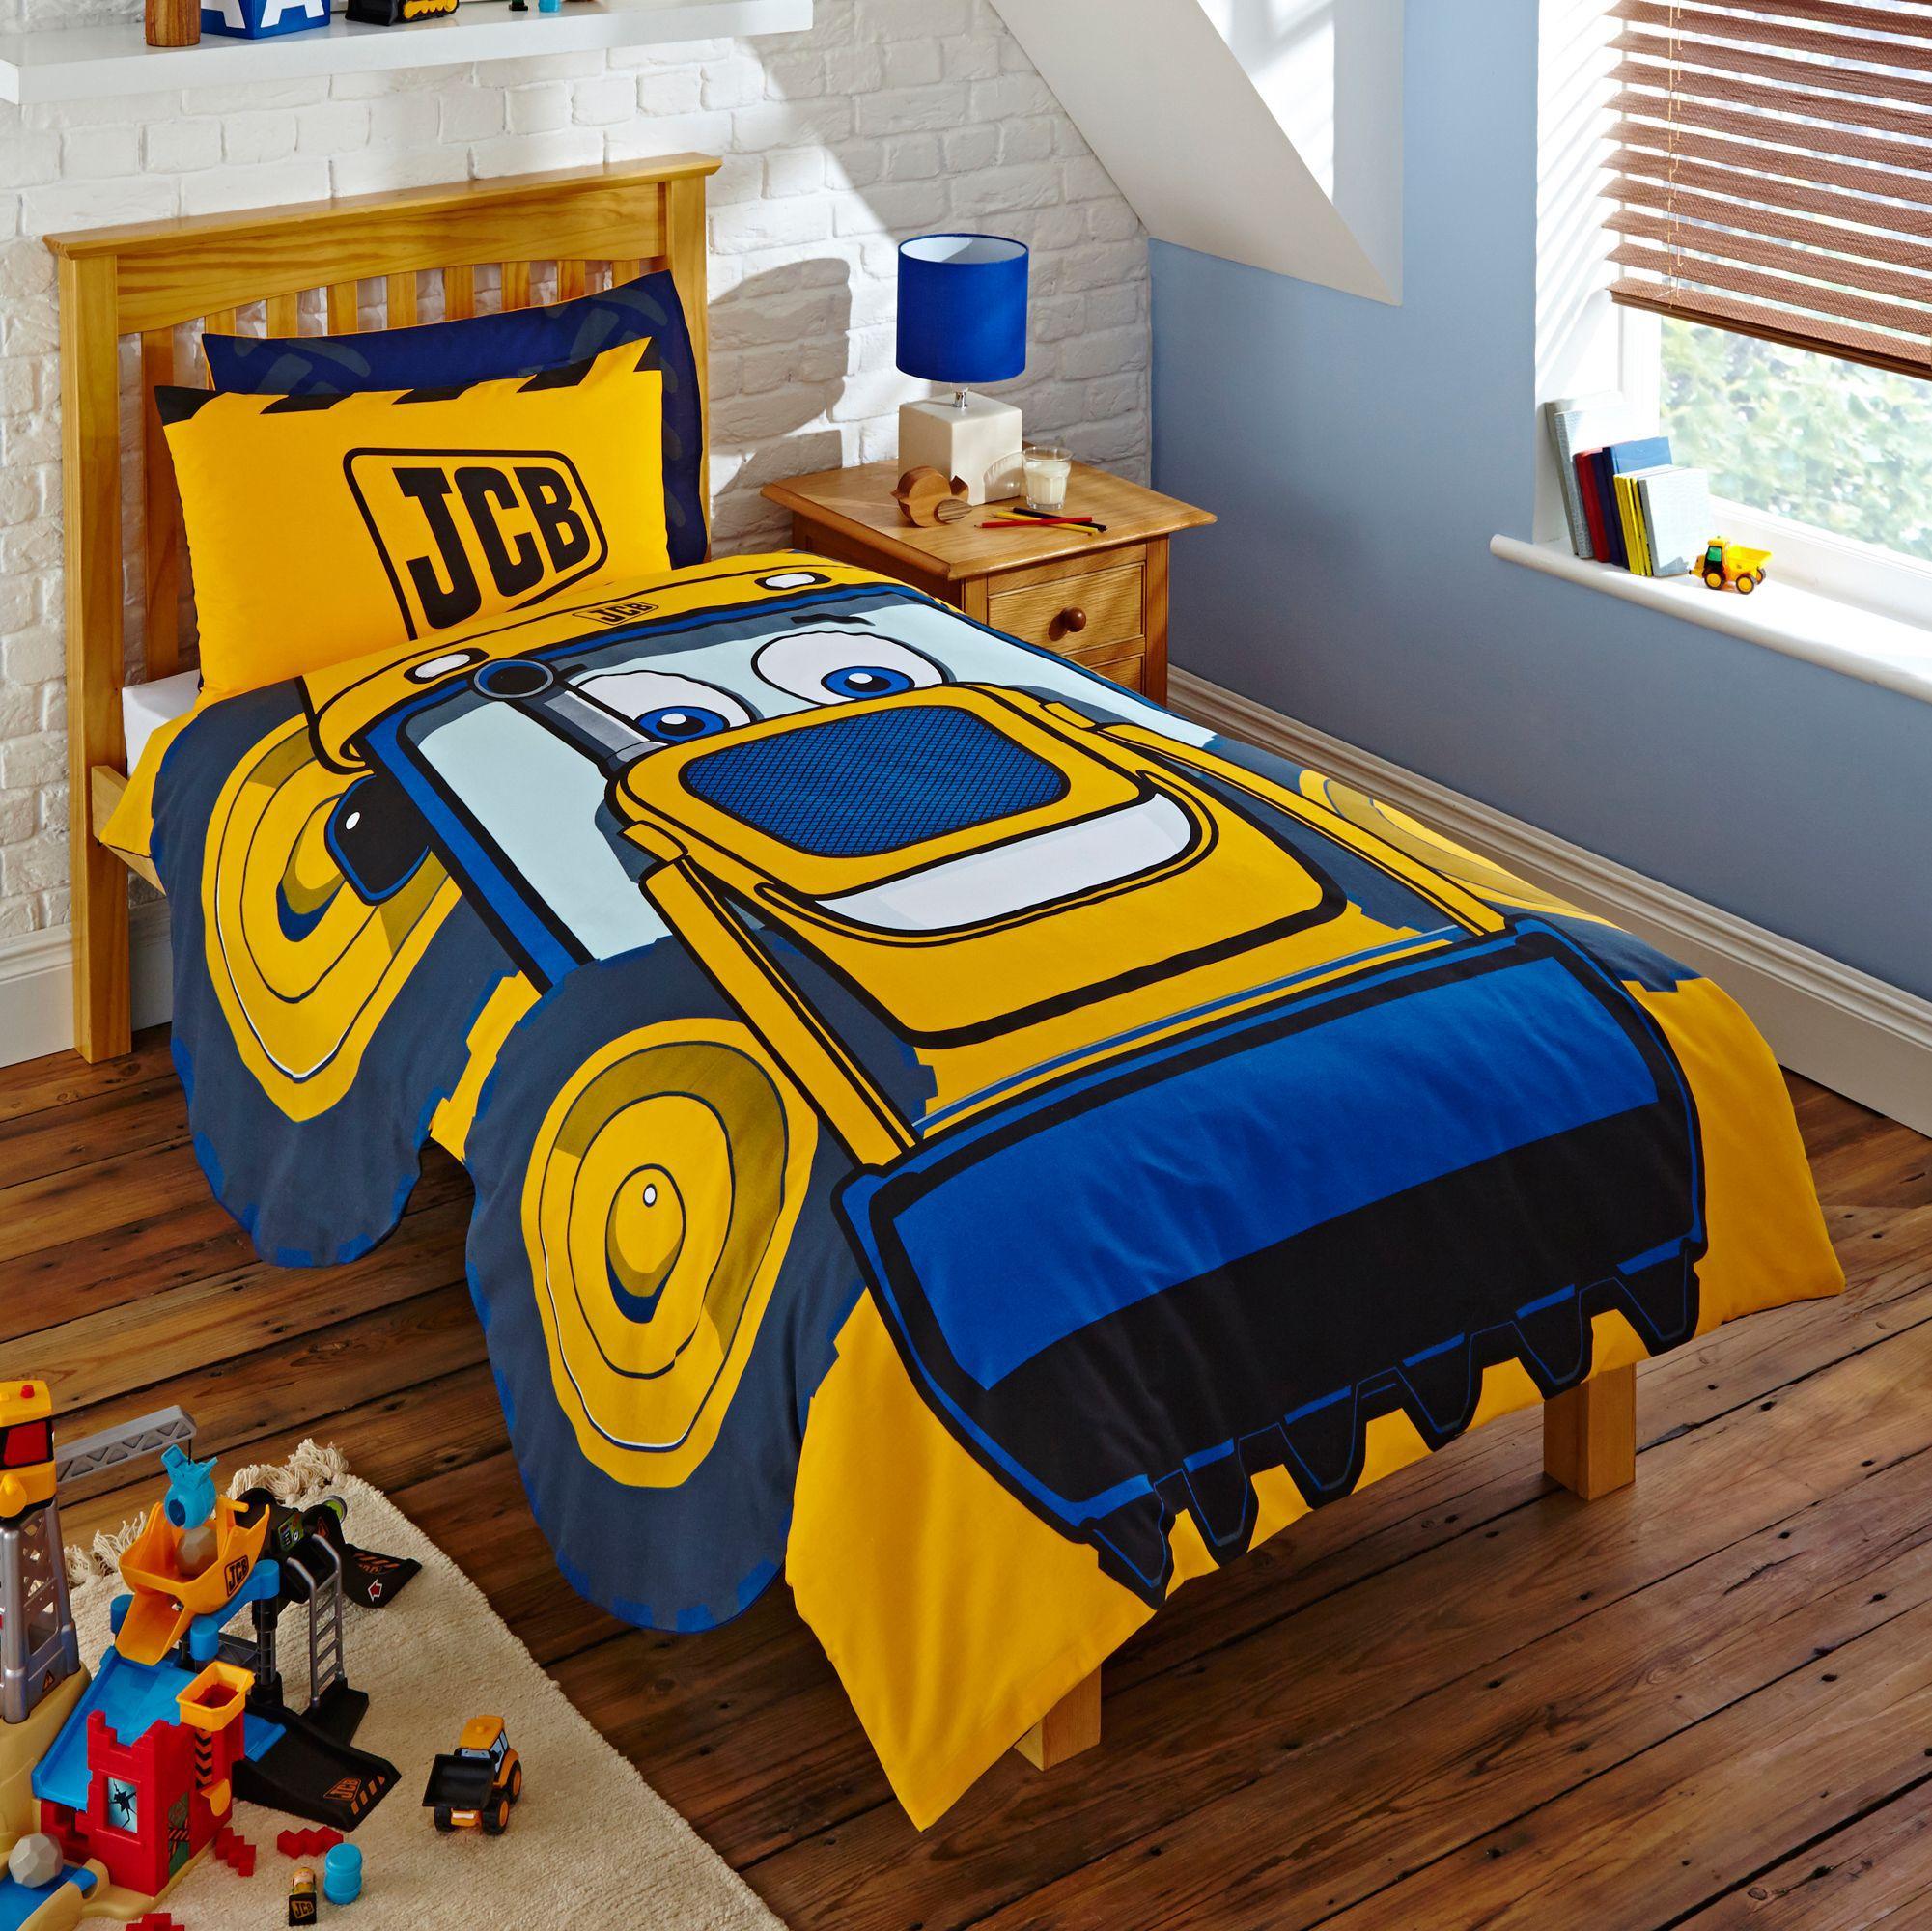 Jcb joey yellow single duvet set departments diy at b q for B q bedroom furniture